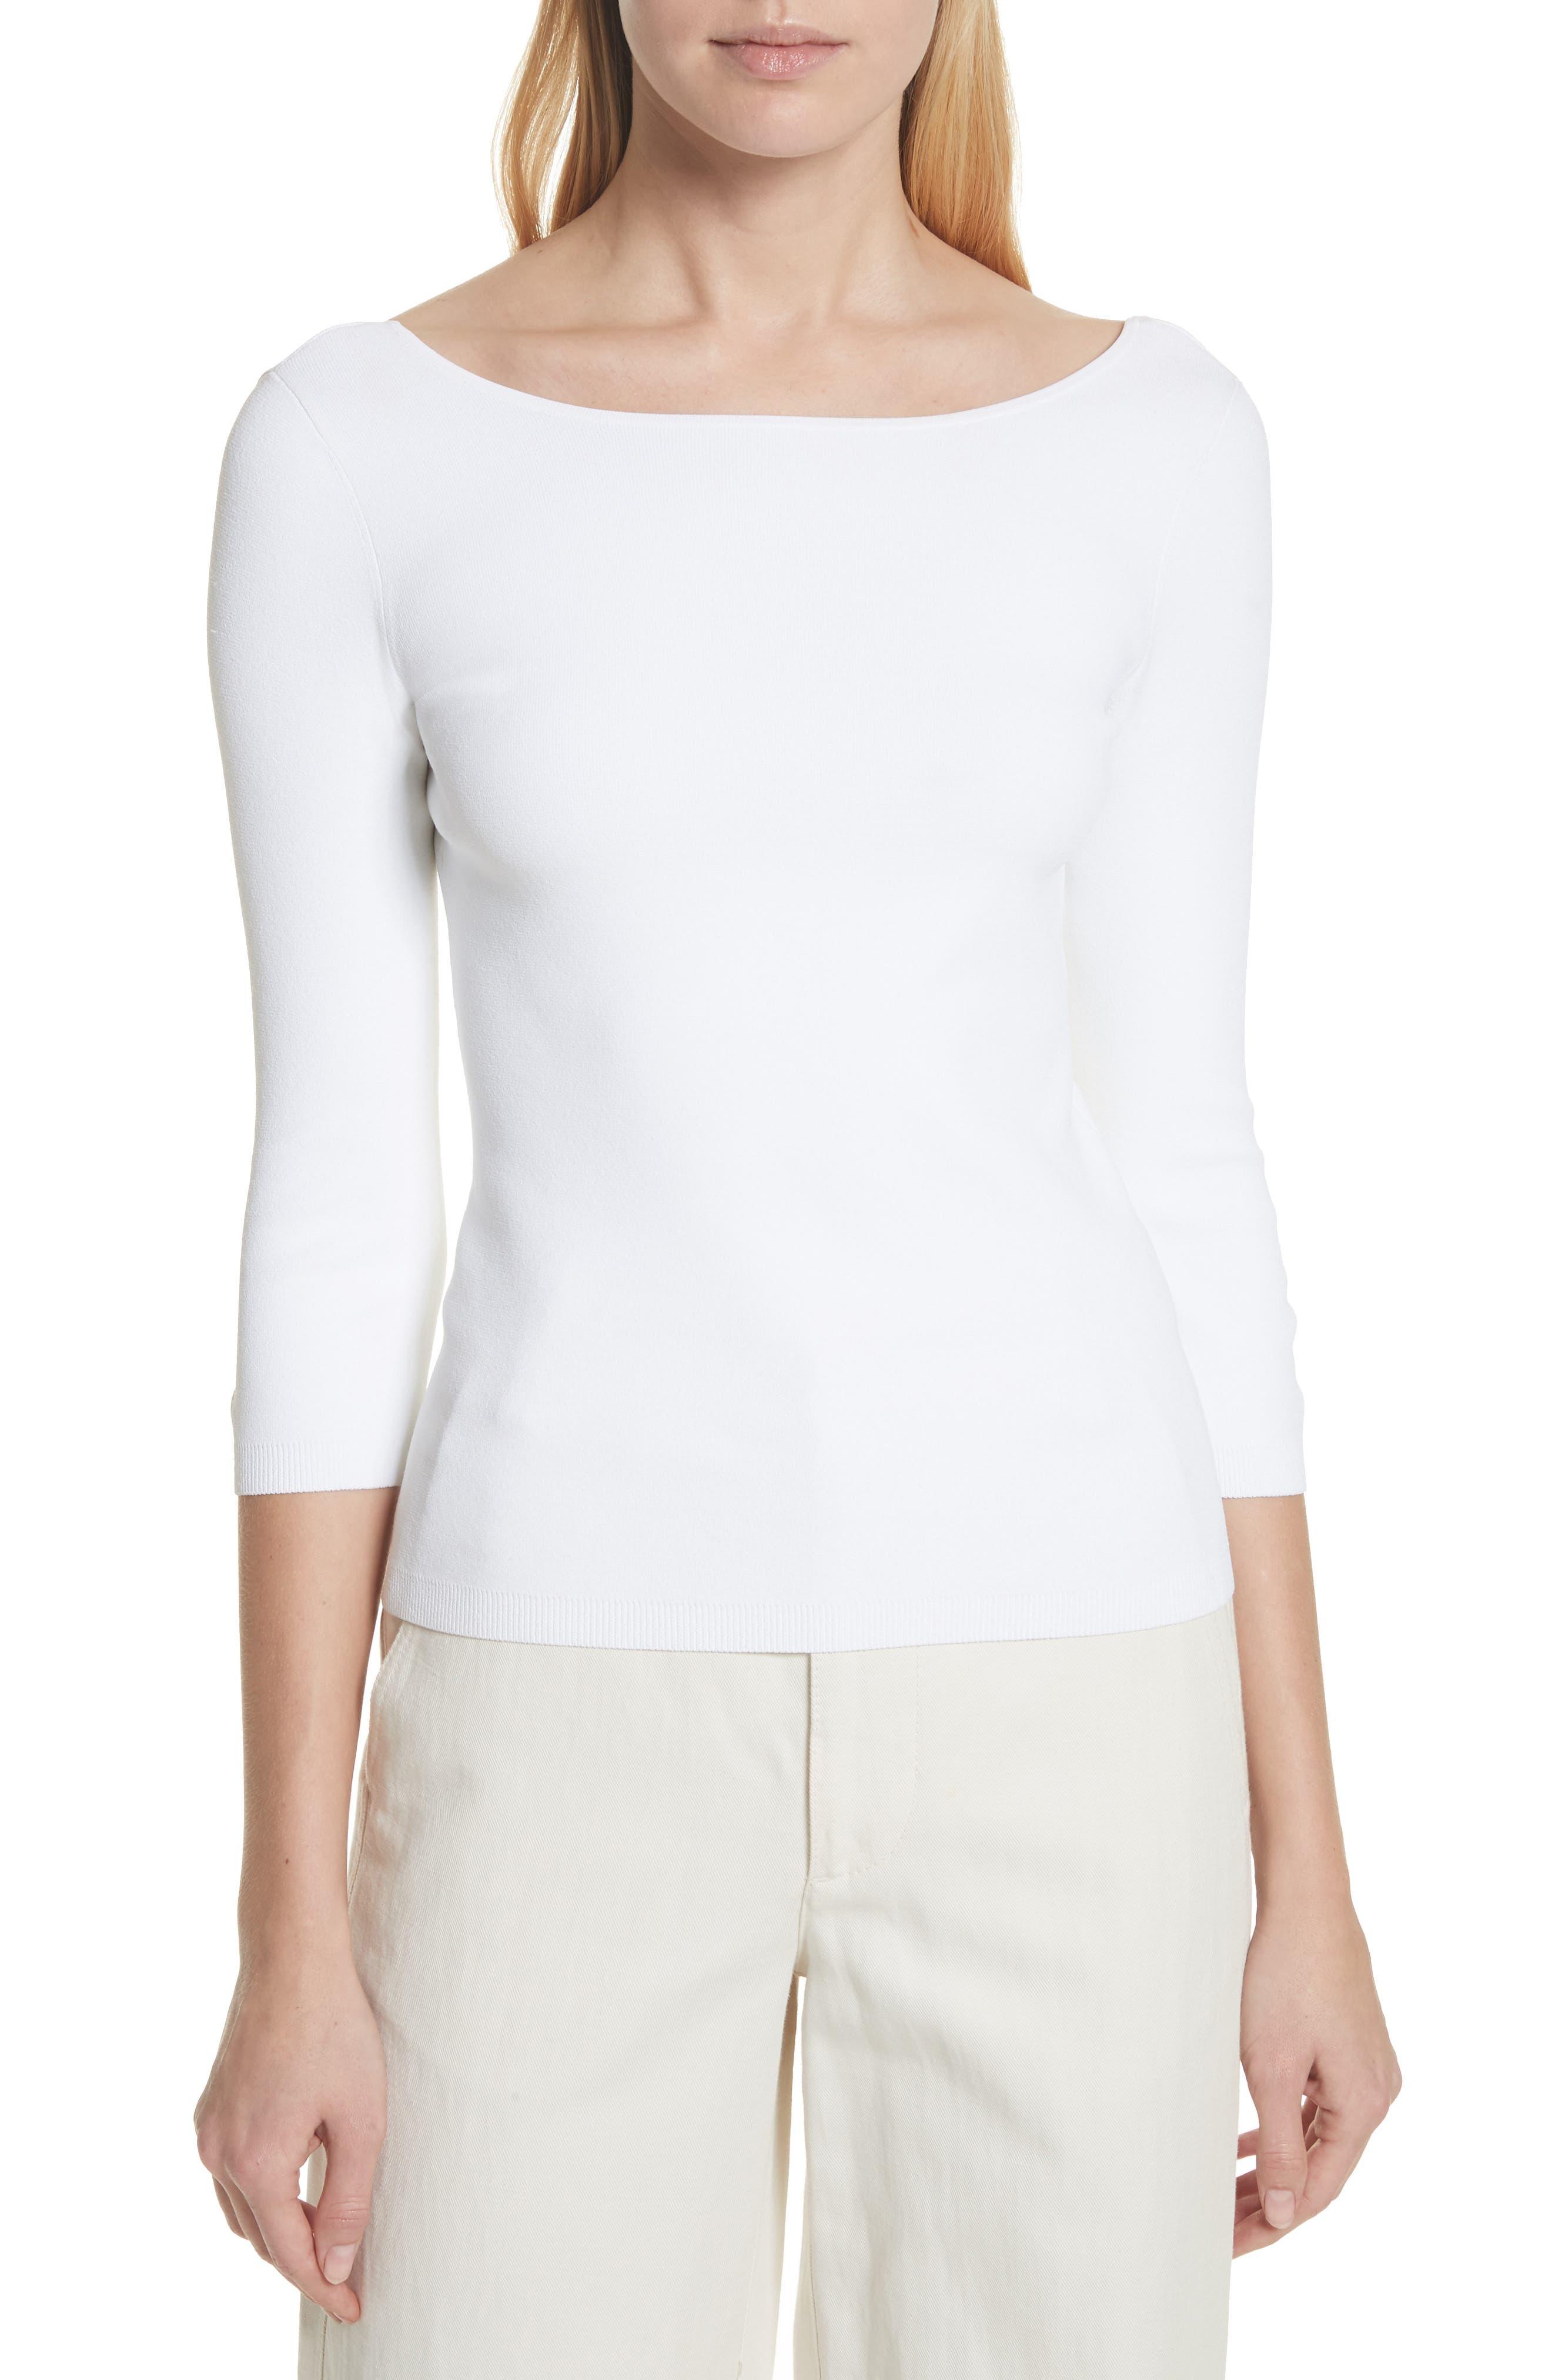 U-Back Top,                         Main,                         color, Optic White